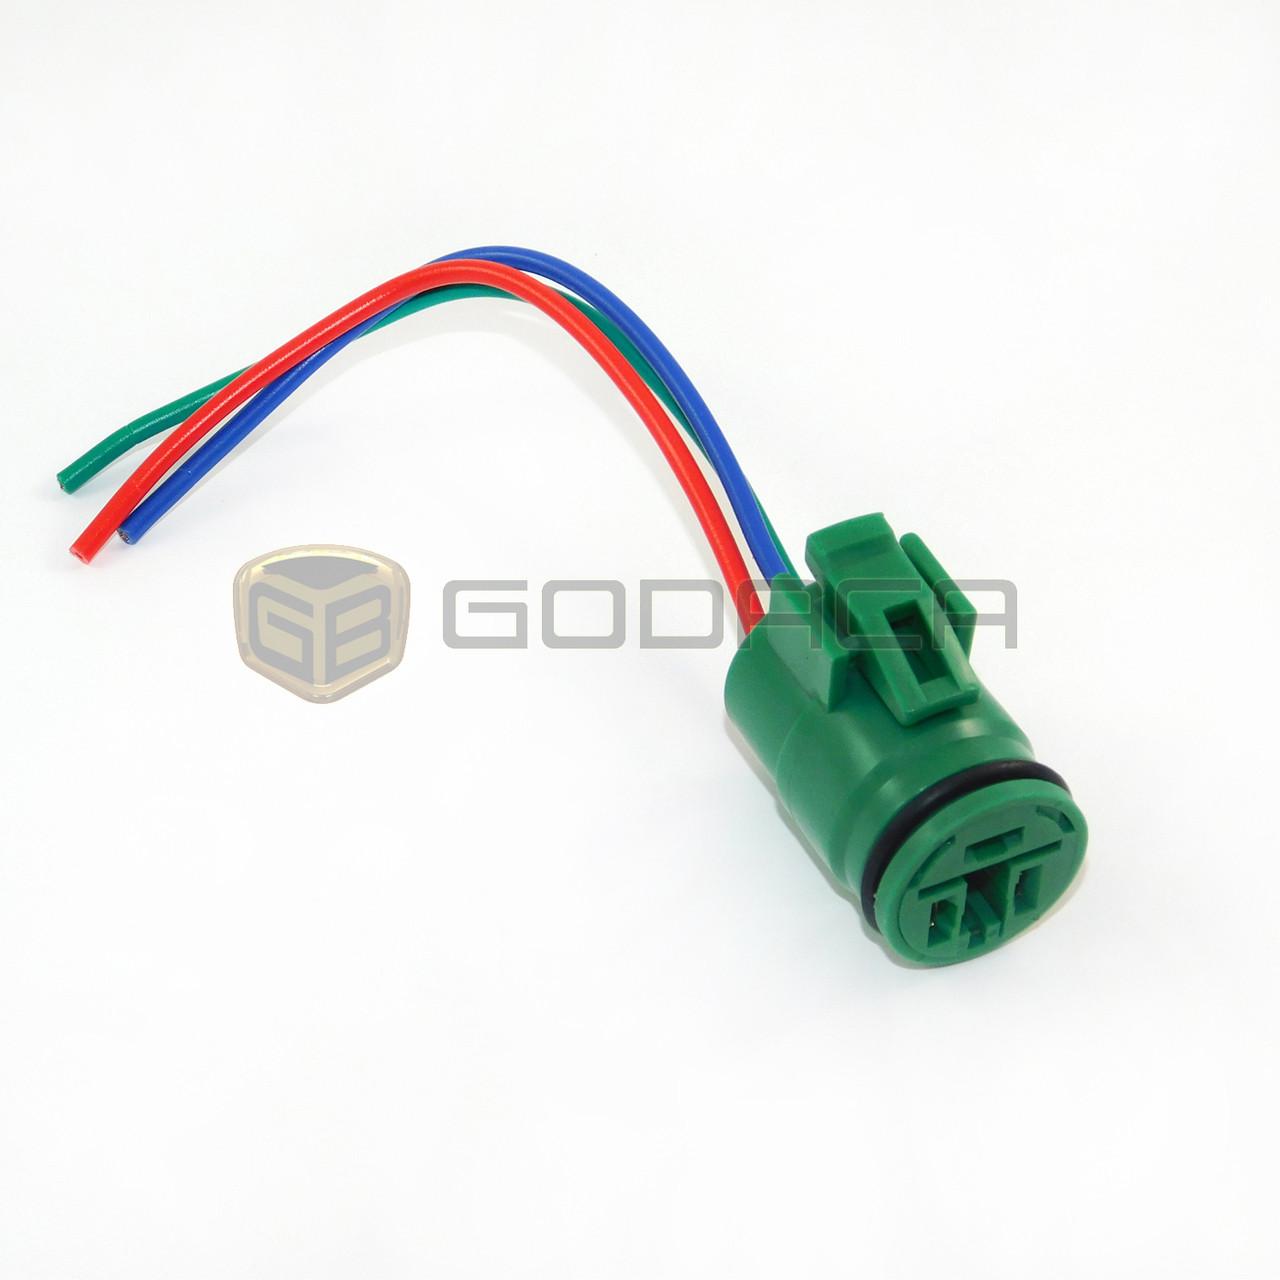 hight resolution of 1x connector 3 way 3 pin for toyota alternator 90980 10341 godaca llc